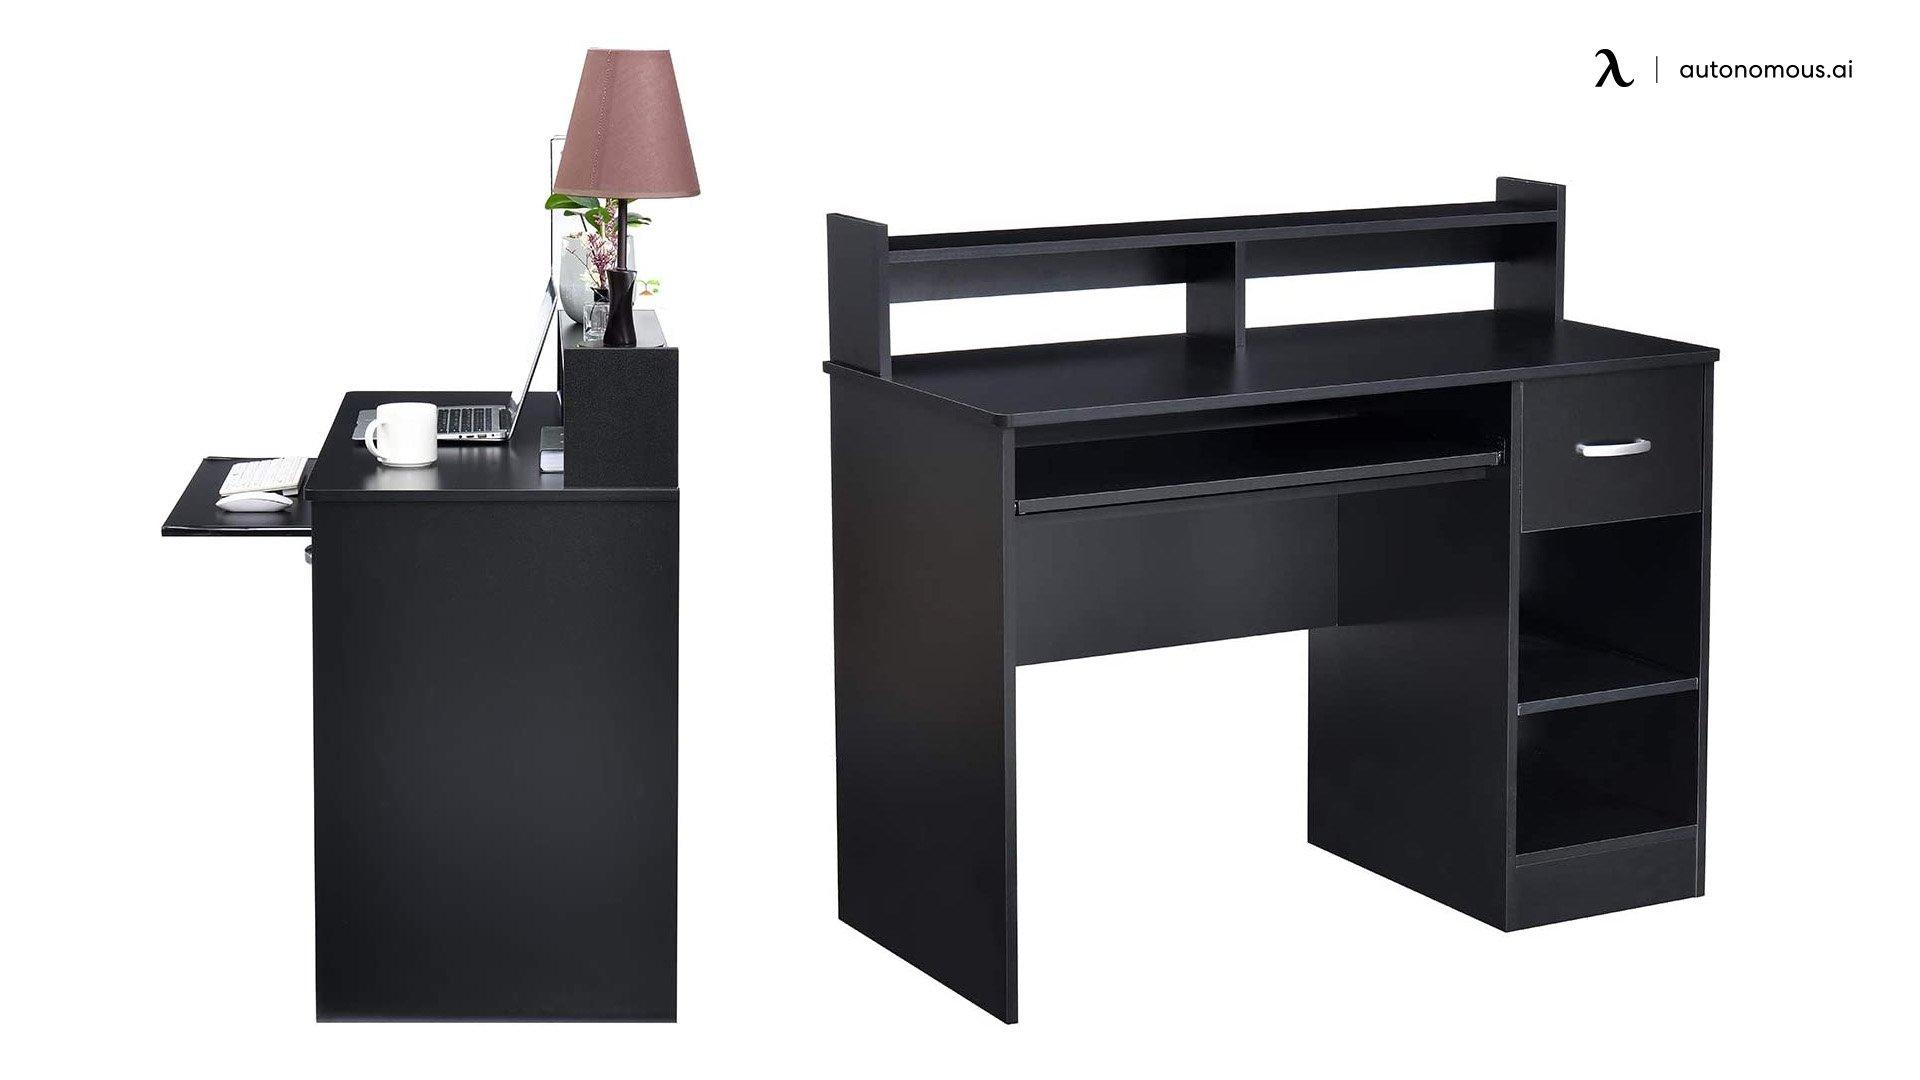 ROCKPOINT Axess Black Contemporary Desk